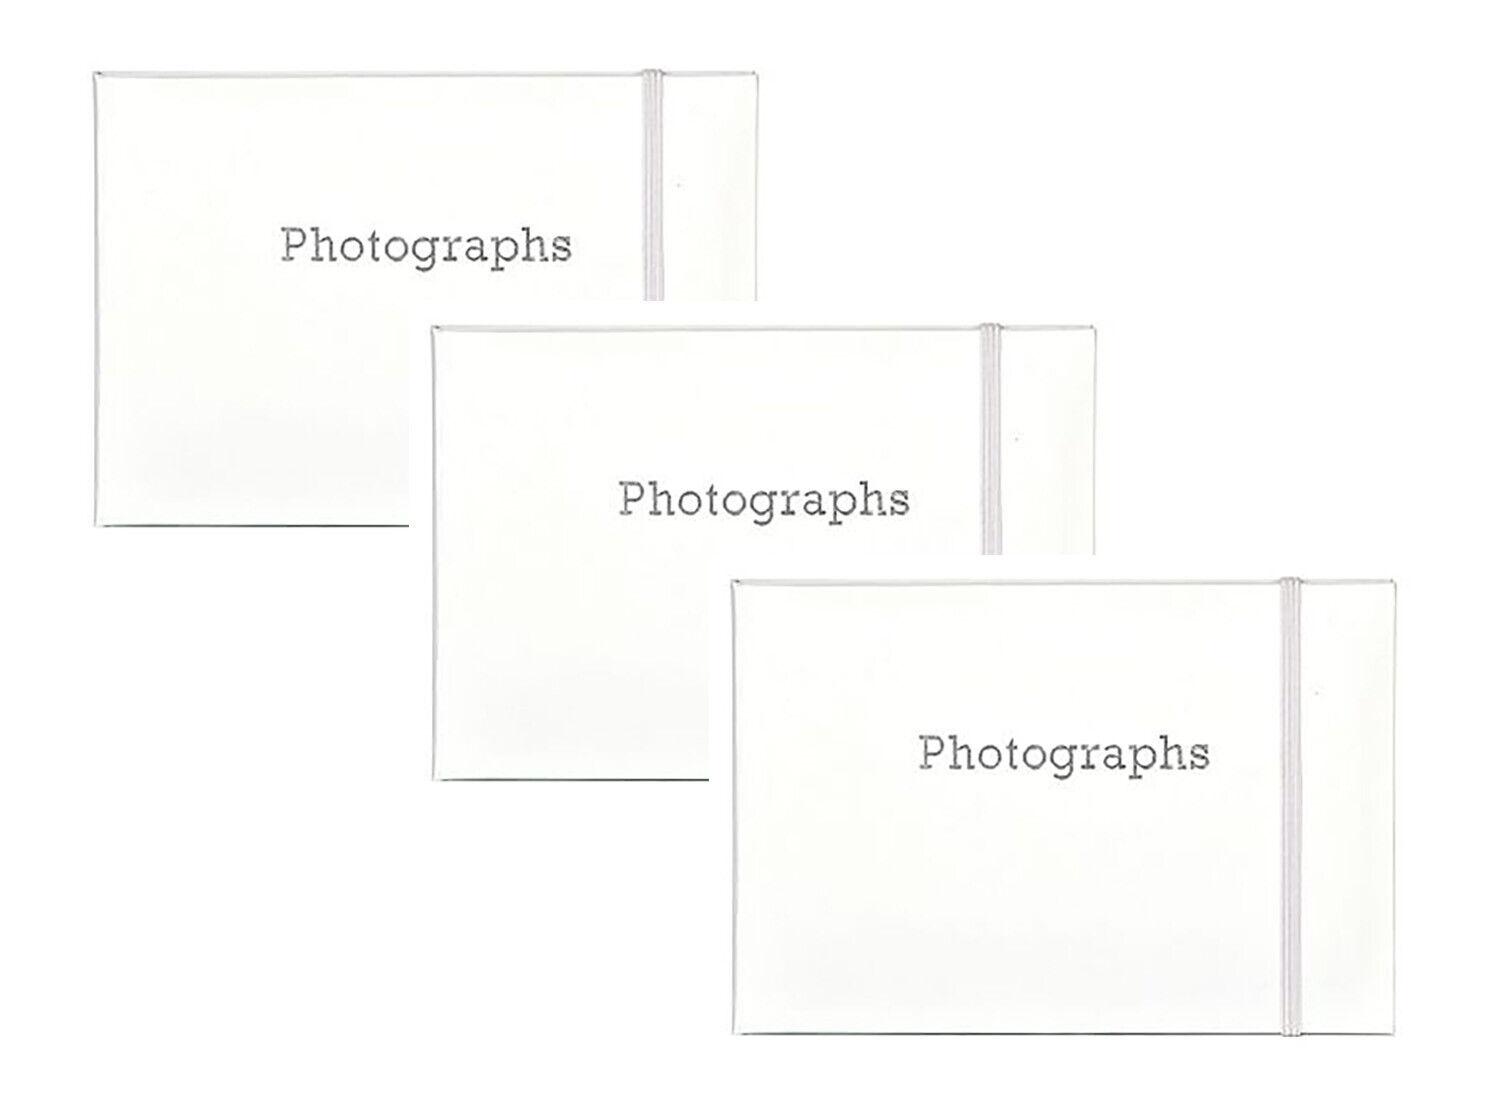 3 x Slip In Photo Album Photography Storage Holds 72 6